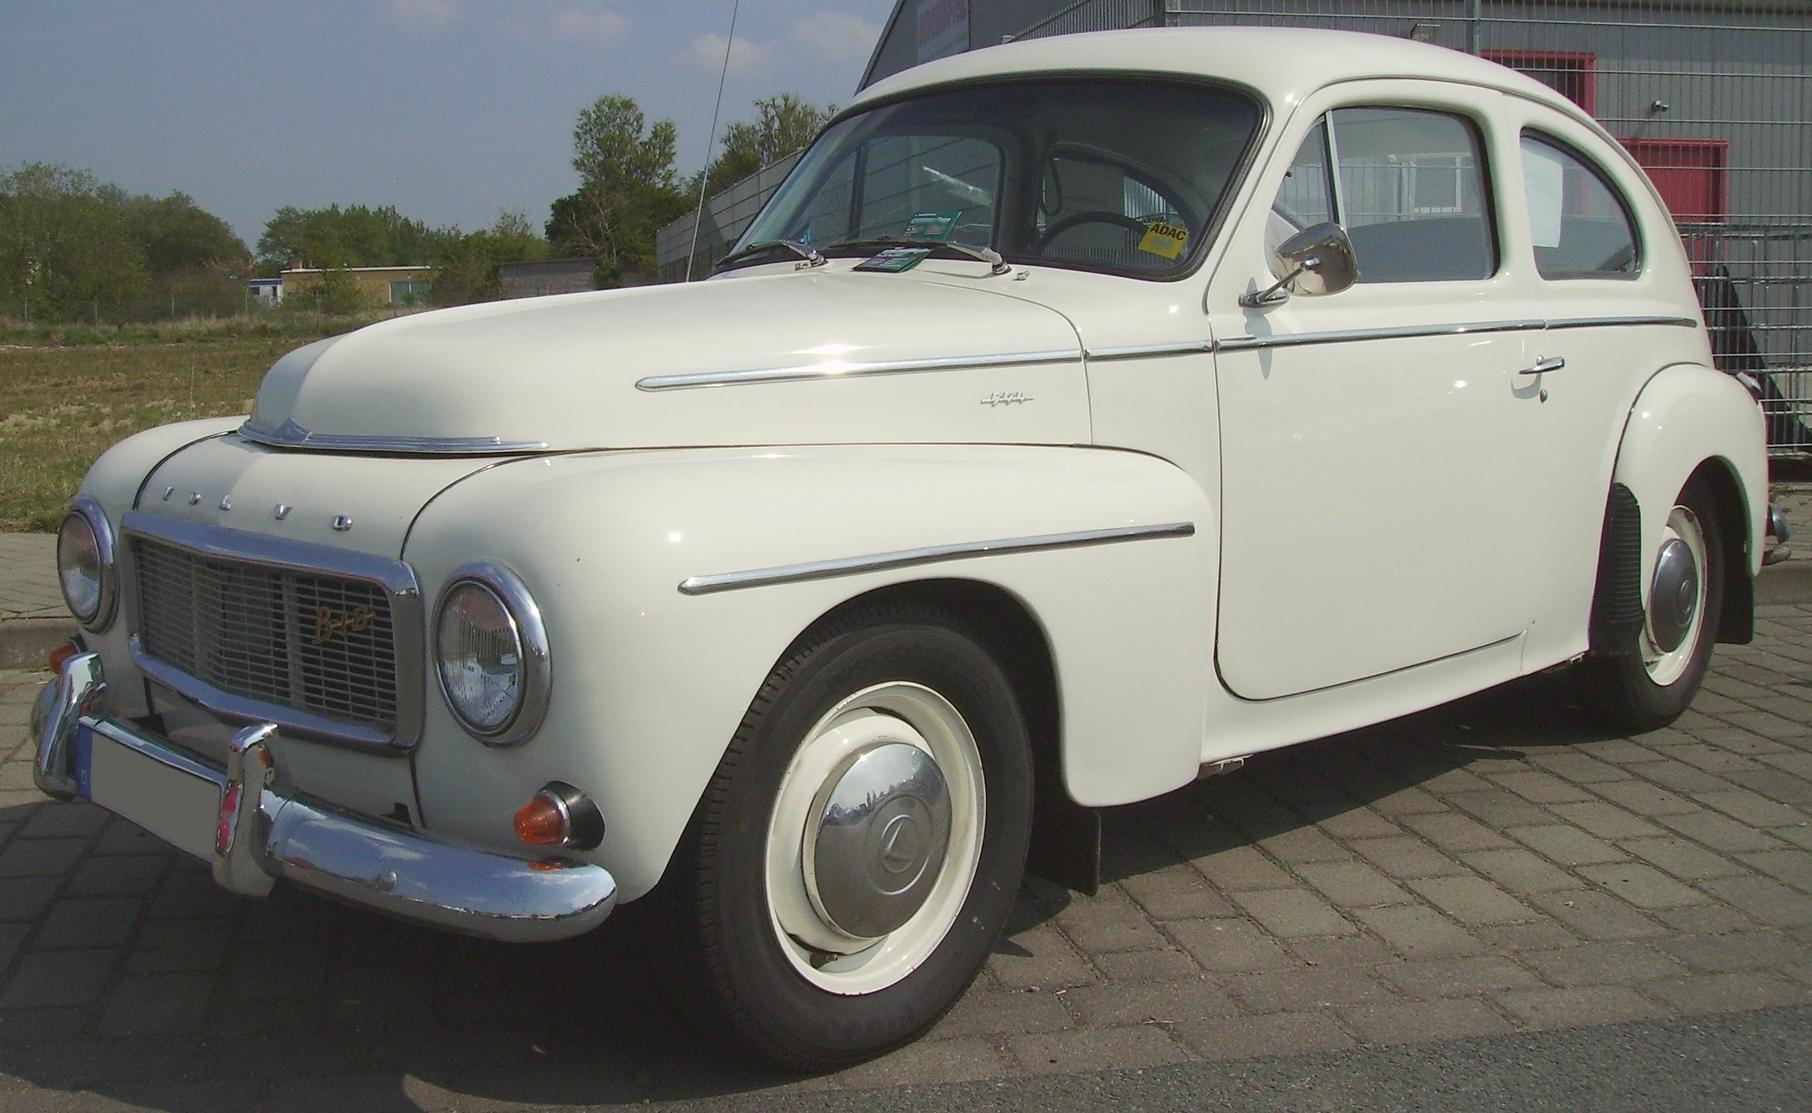 File Volvo Pv544 B18 Jpg